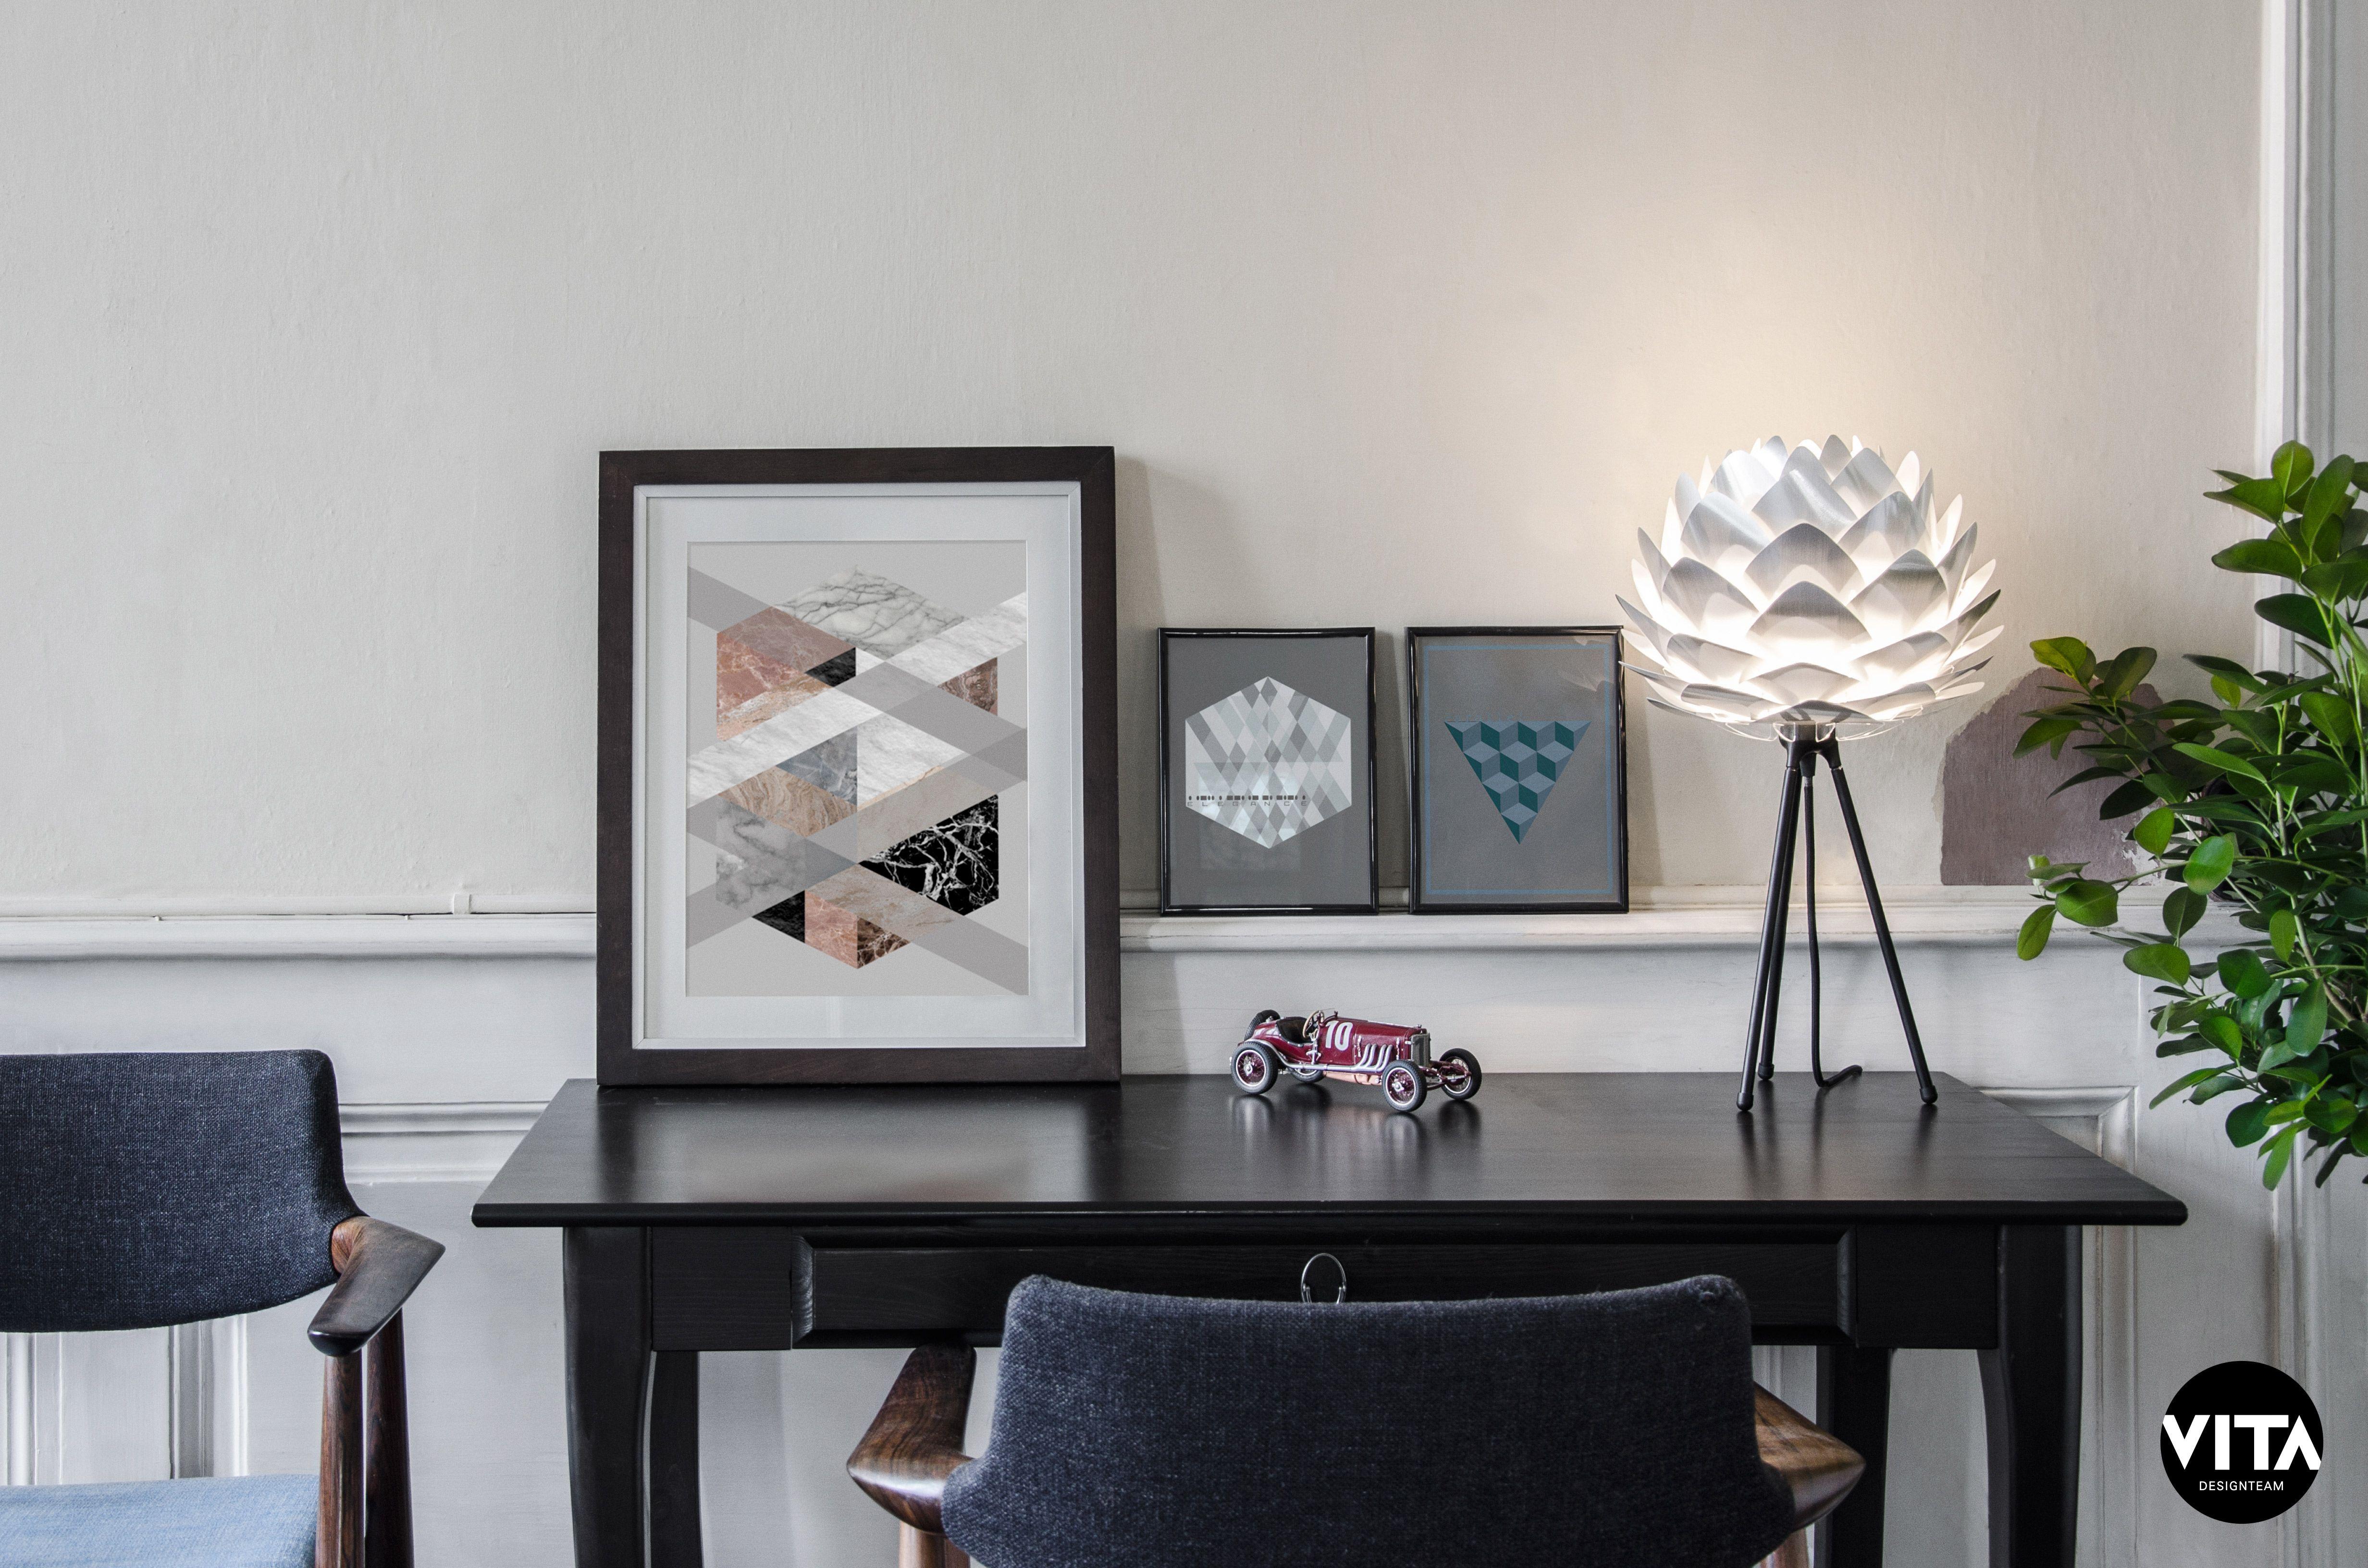 silvia mini steel vita copenhagen environment photos. Black Bedroom Furniture Sets. Home Design Ideas